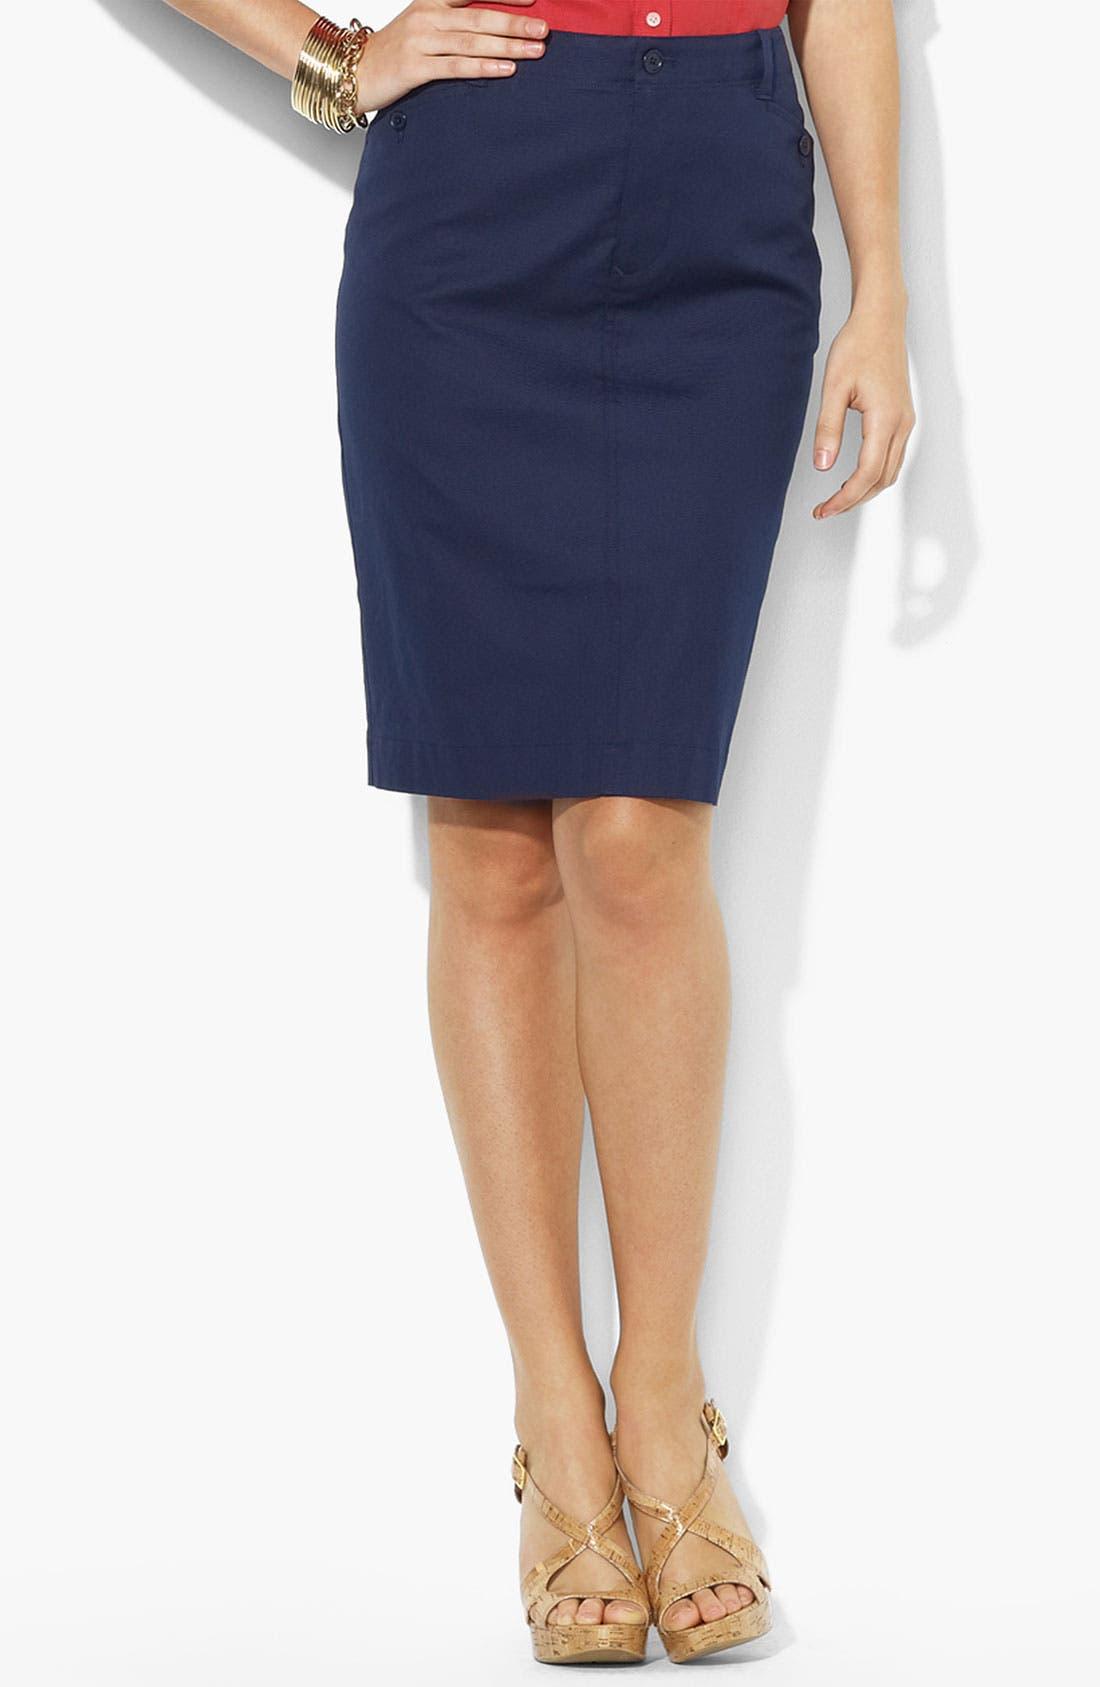 Alternate Image 1 Selected - Lauren Ralph Lauren Buckle Back Straight Skirt (Petite) (Online Only)